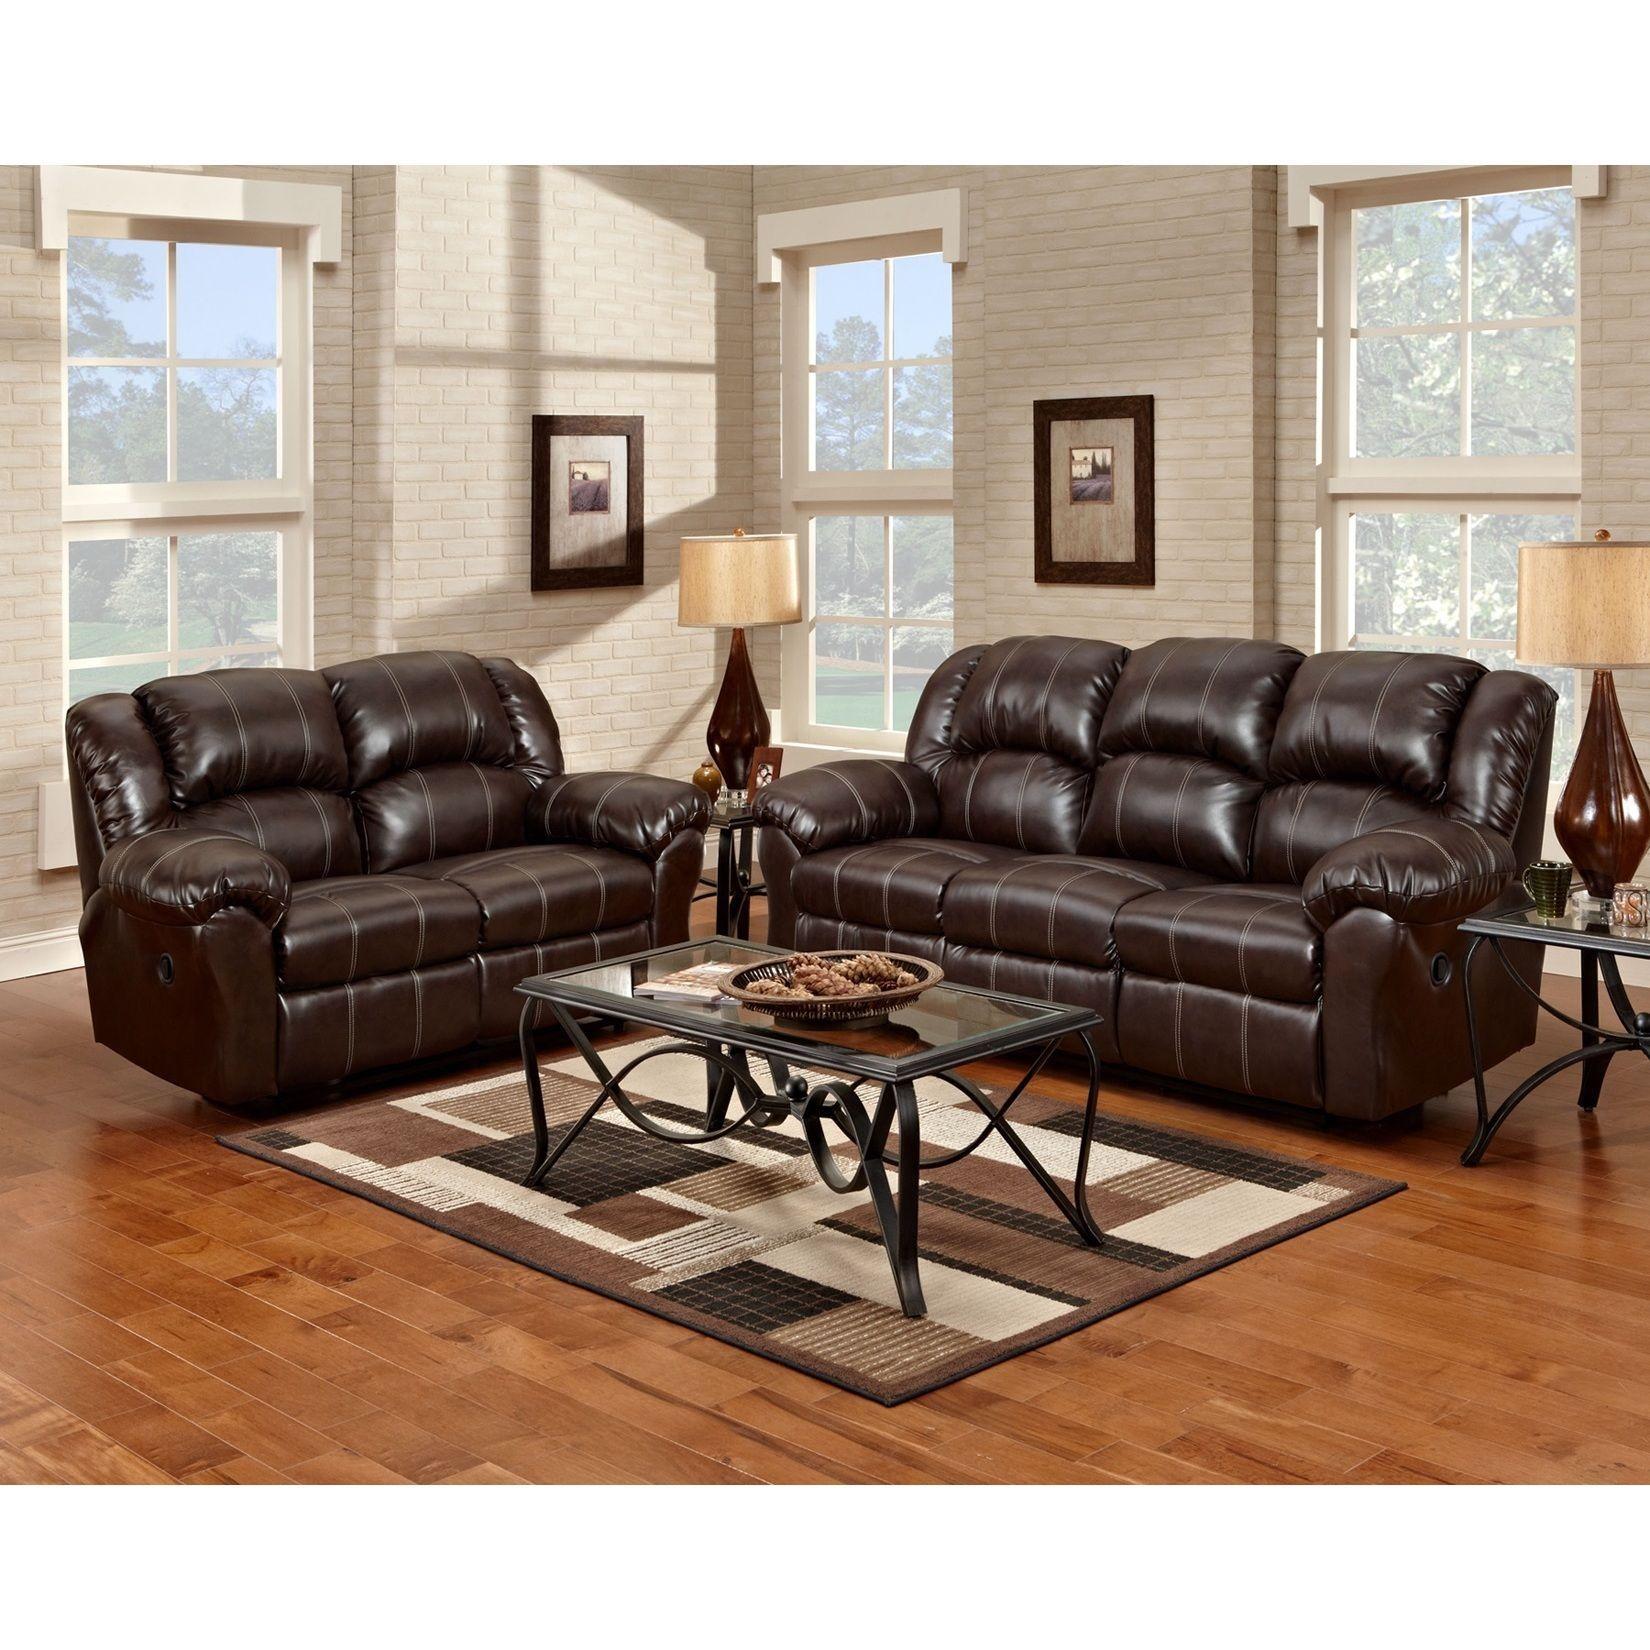 Brandan Bonded Leather Dual Reclining Sofa and Loveseat Brown